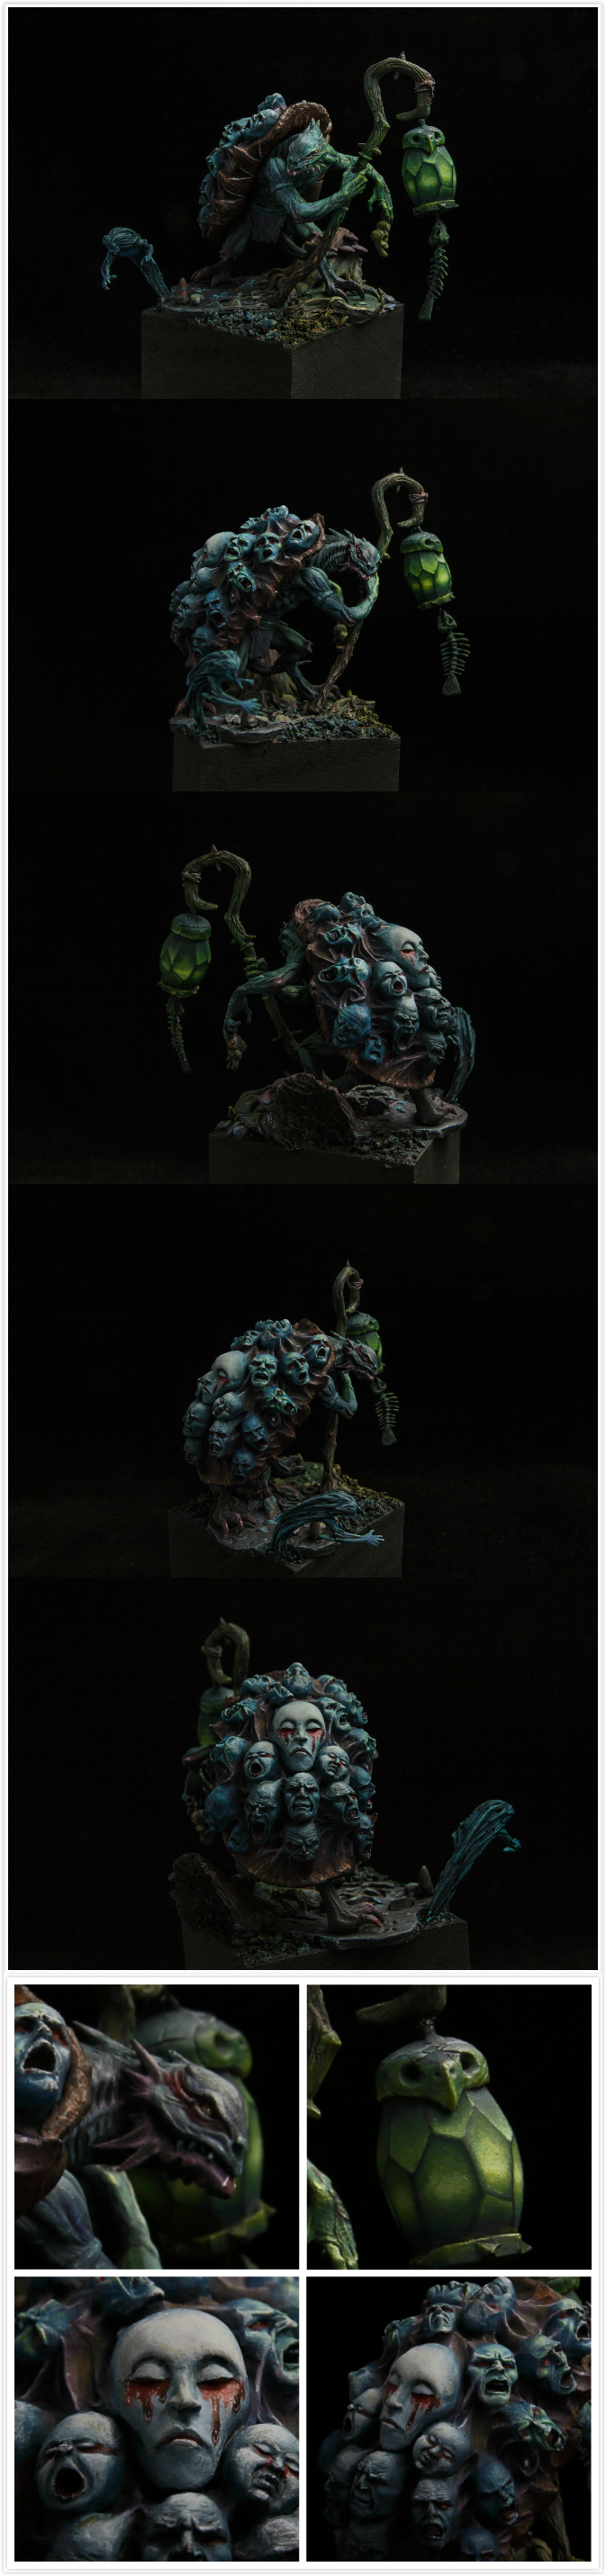 The turtle shaman